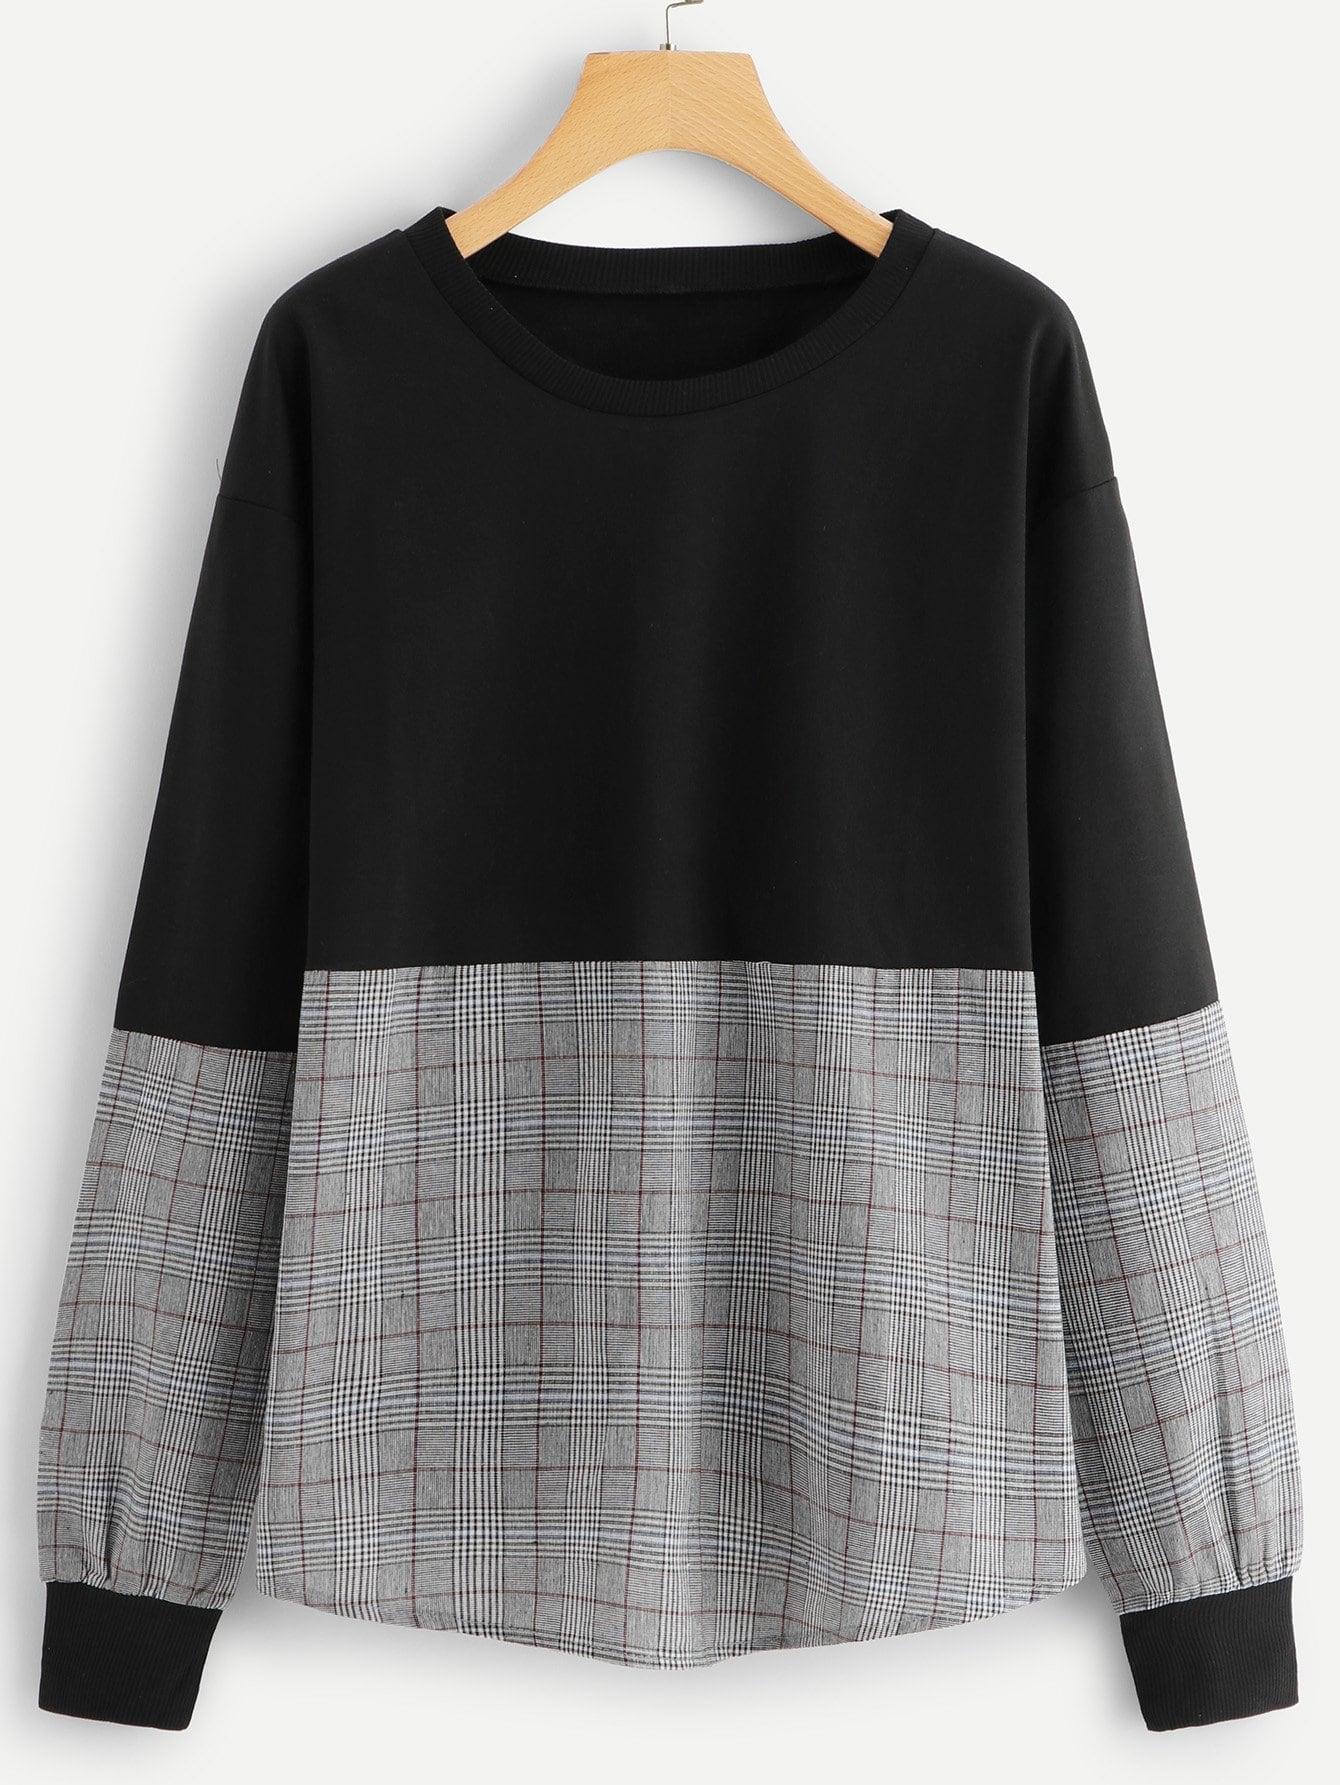 Tartan Plaid Contrast Sweatshirt